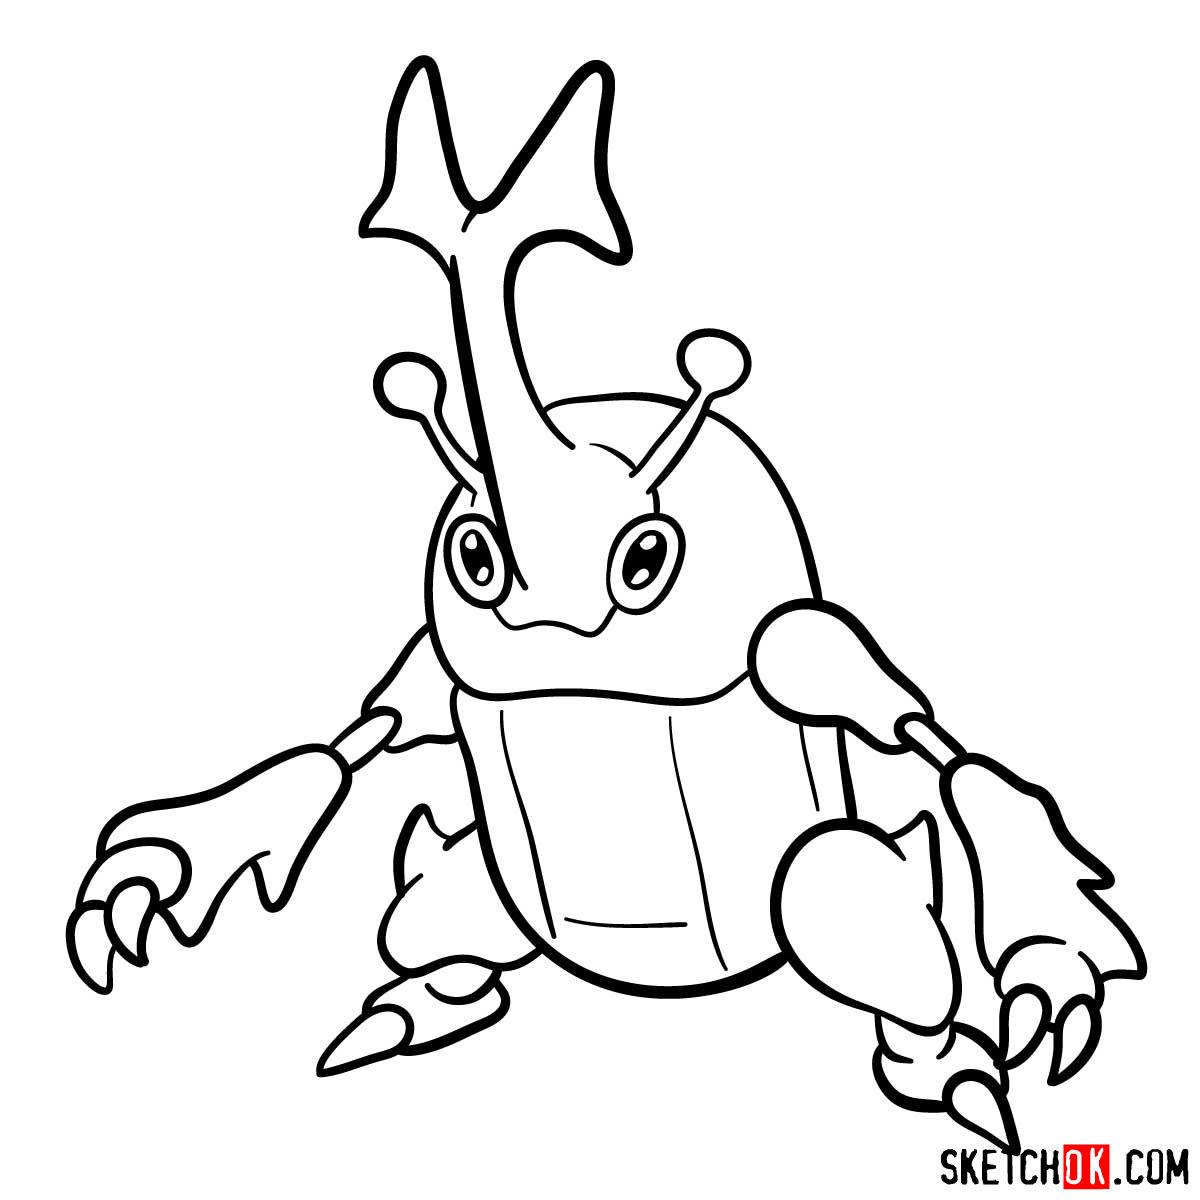 How to draw Heracross Pokemon - step 11